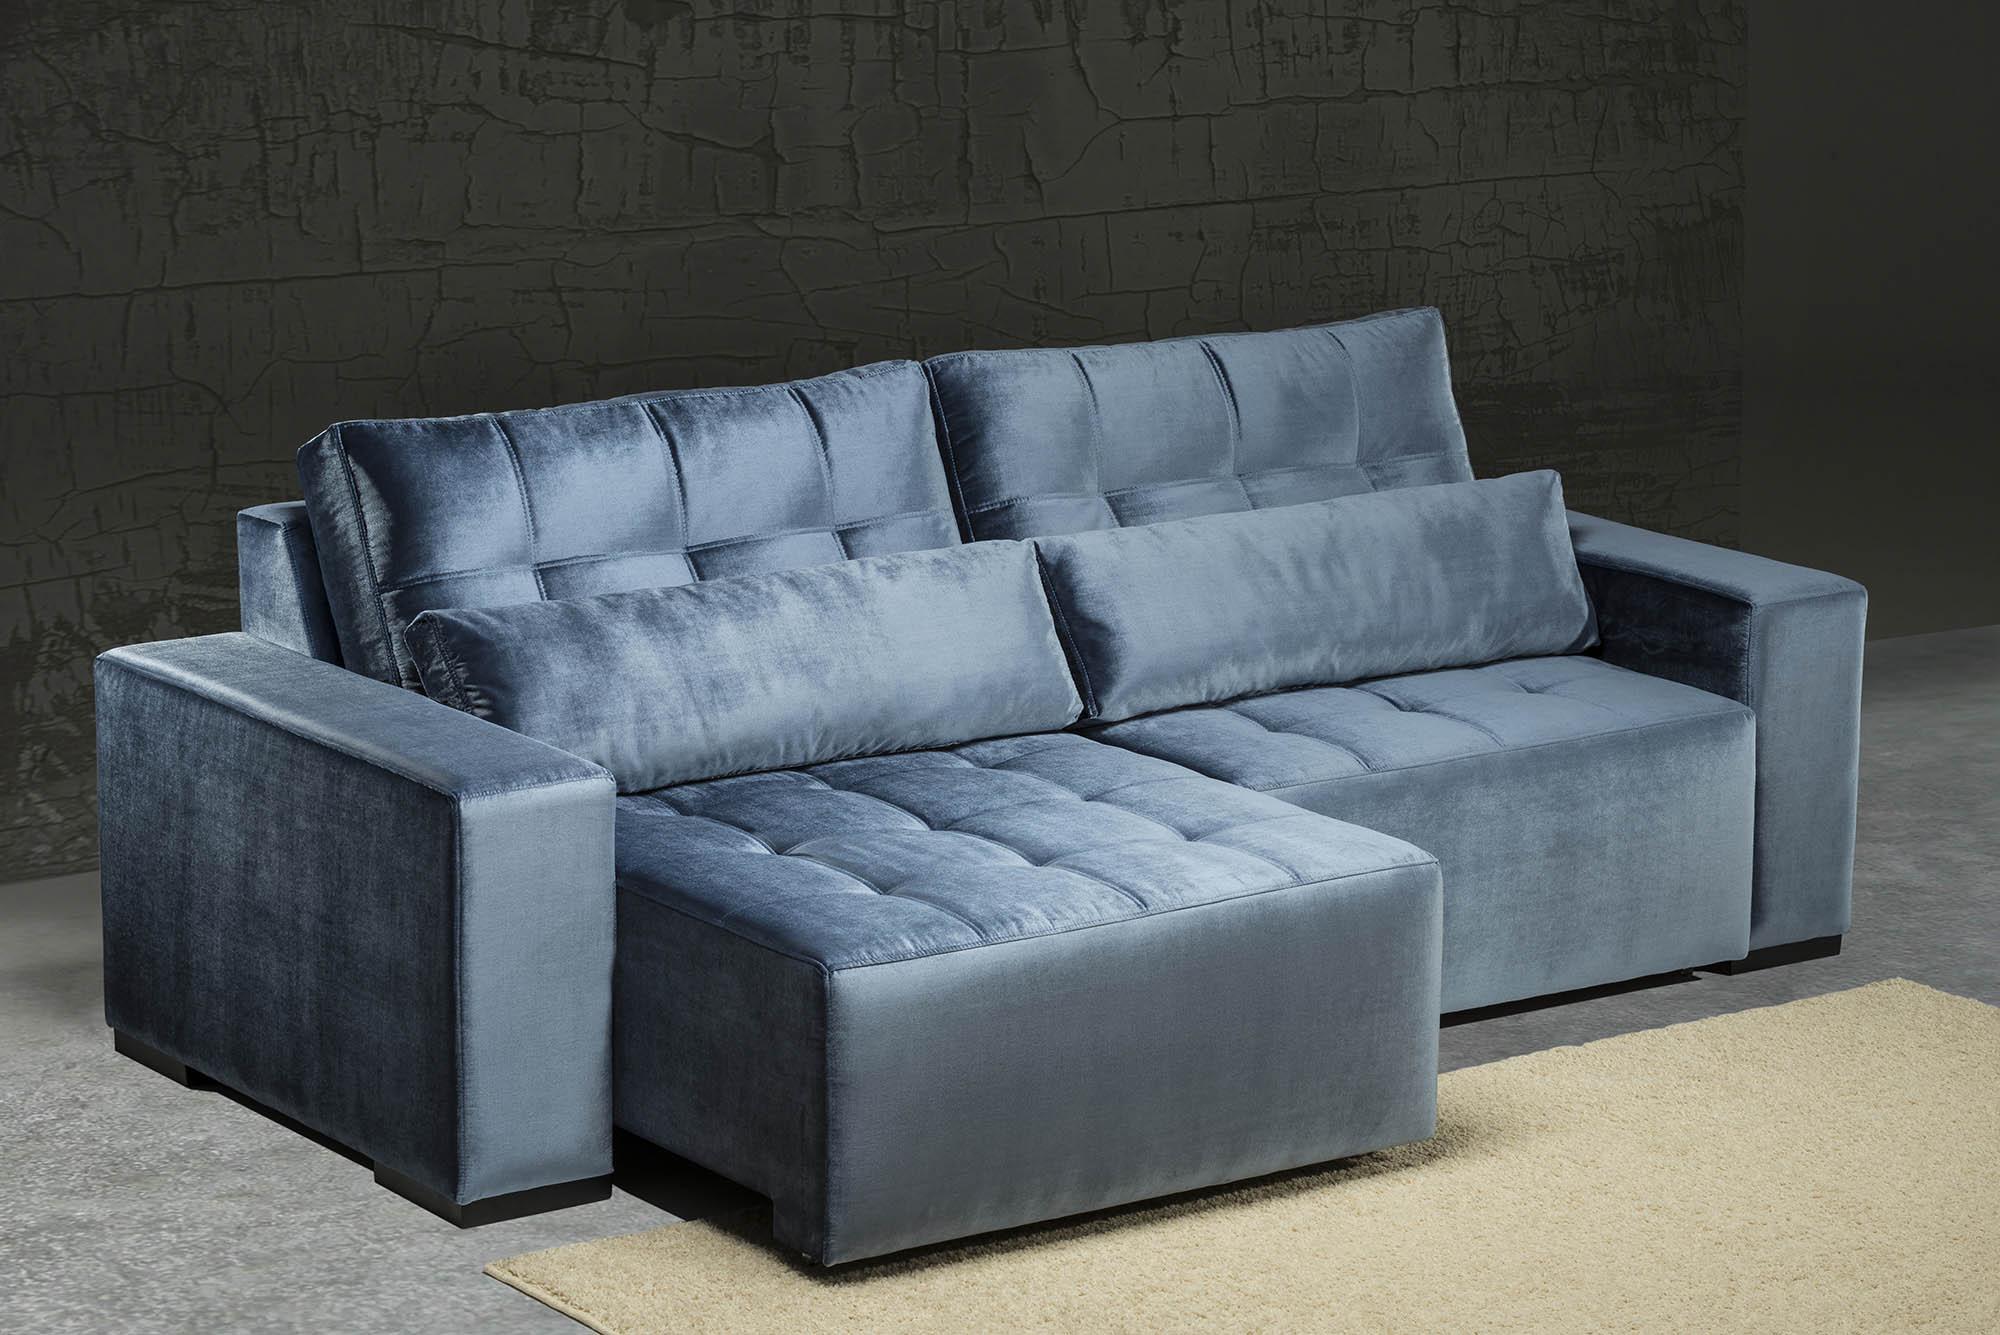 Sofa 003 ok